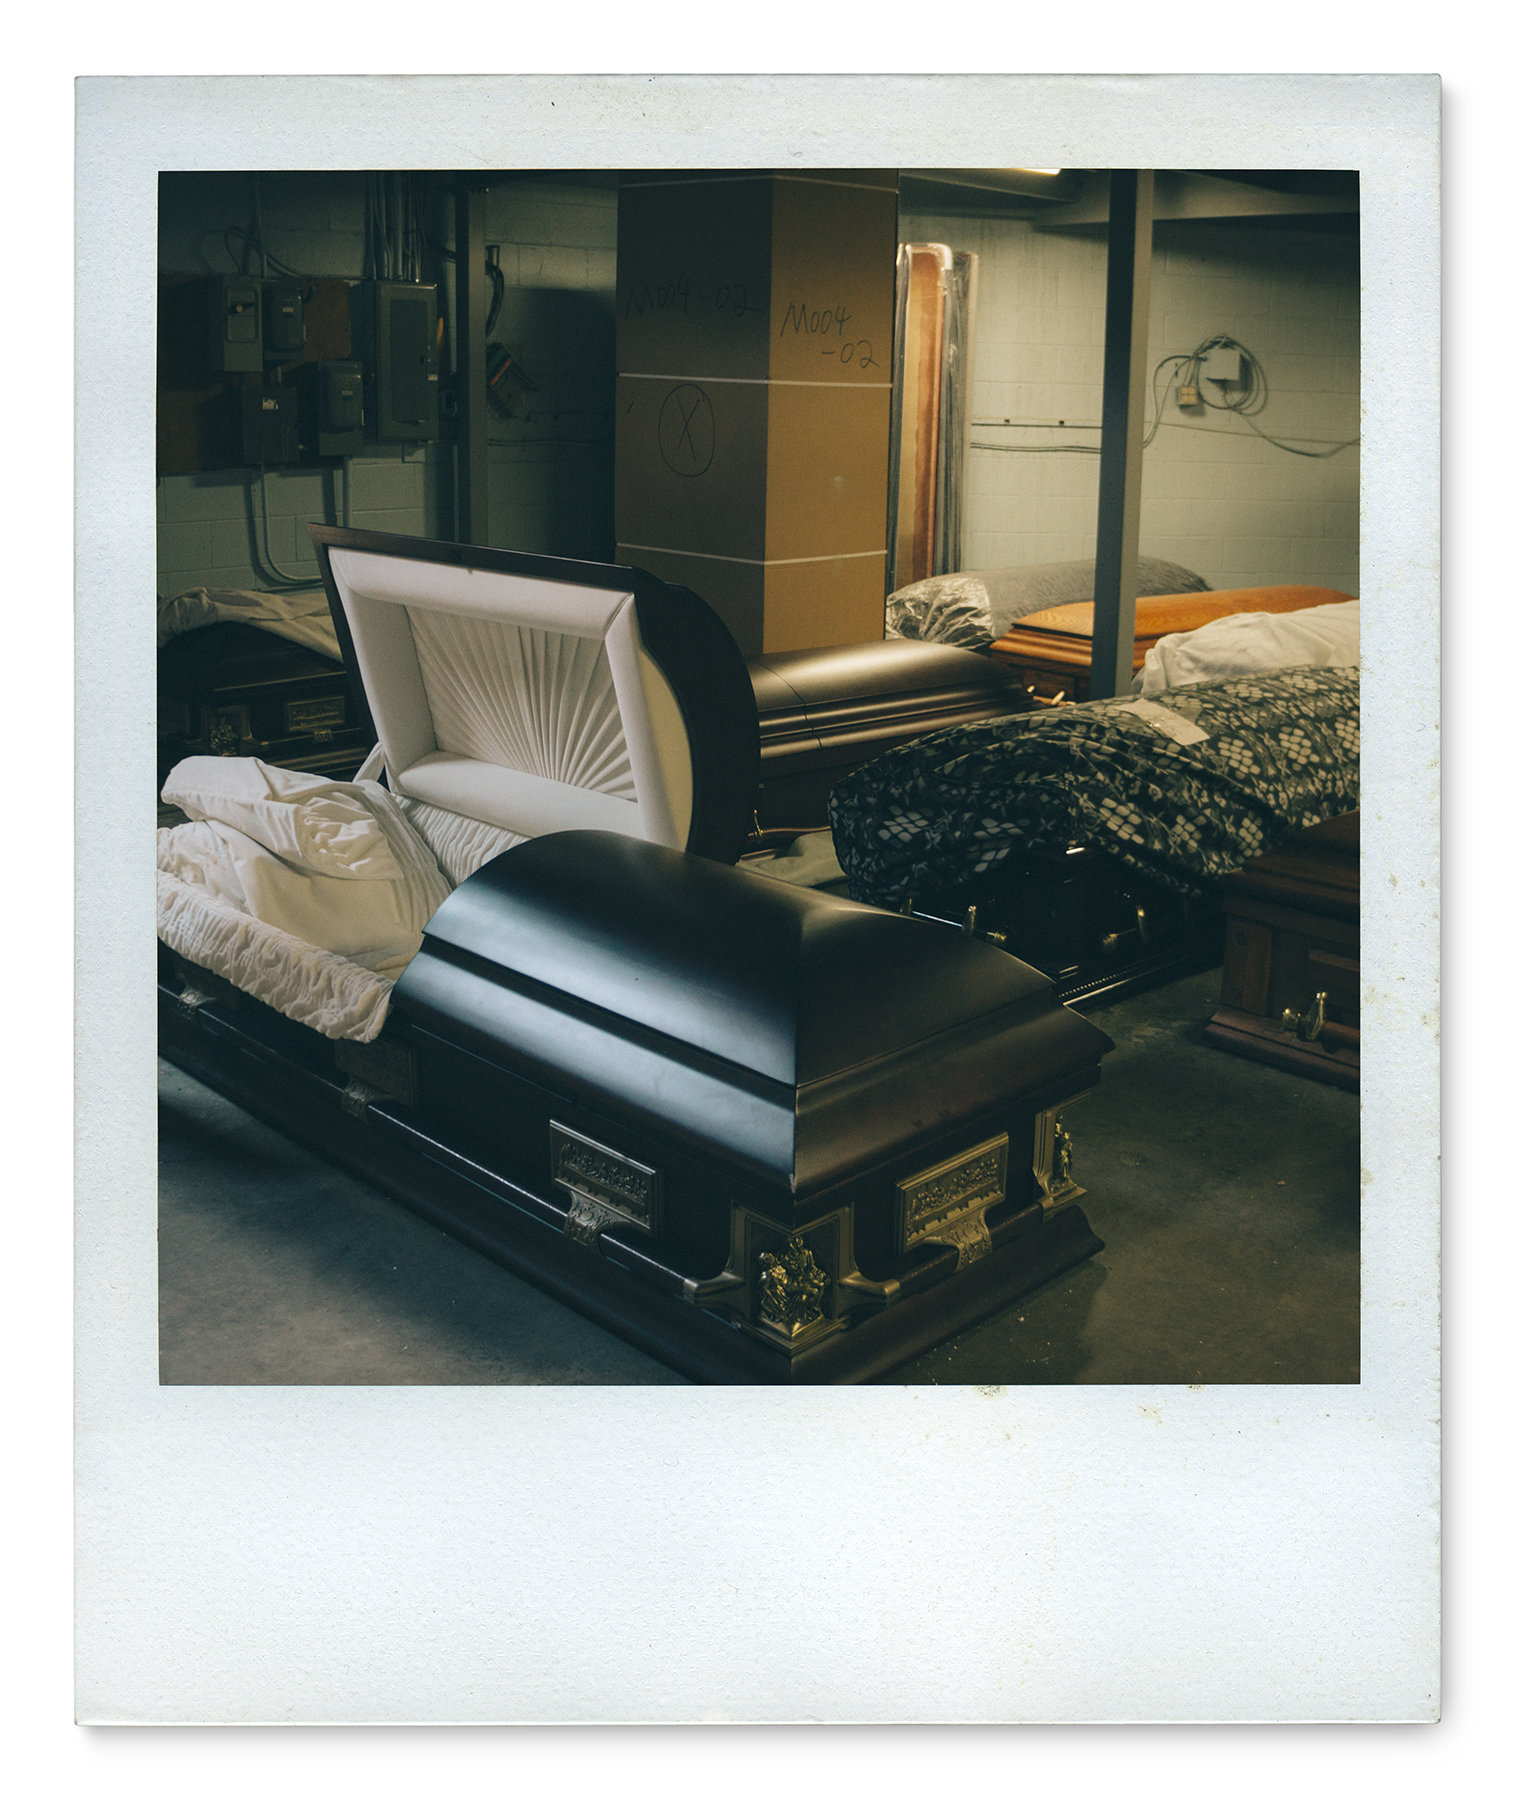 041_Polaroid SX70_DSC08096.jpg